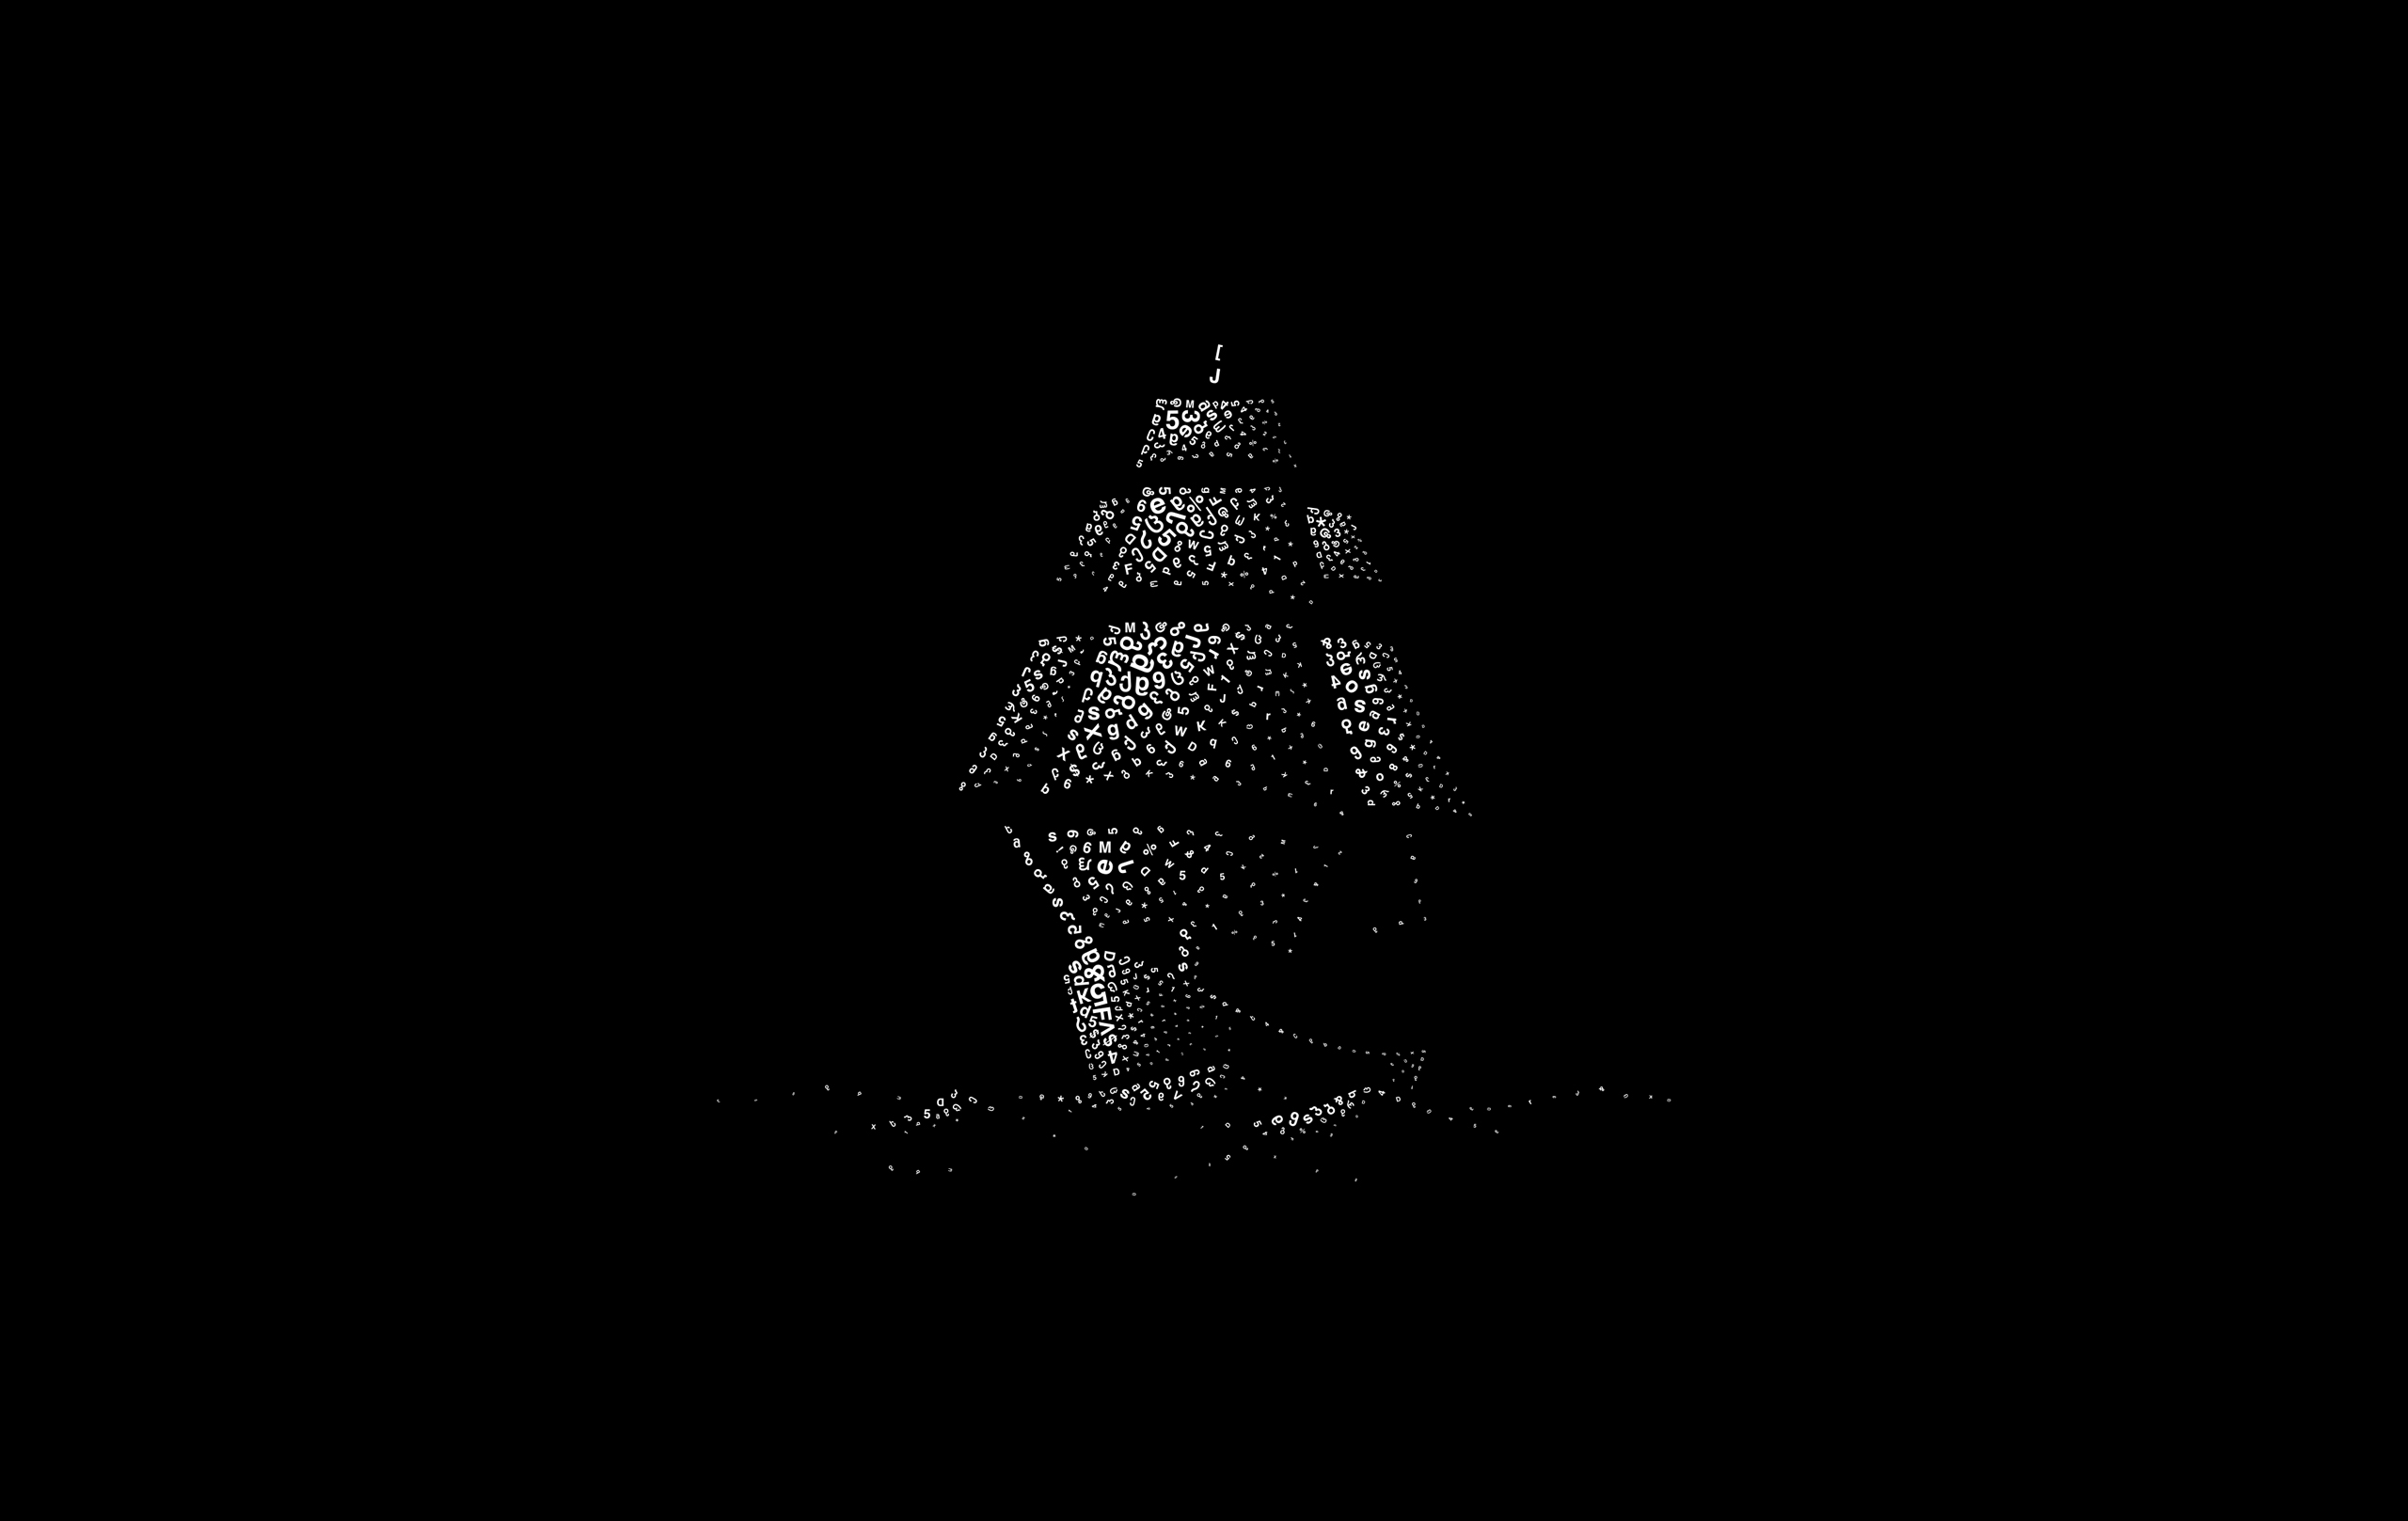 ACT_Illustration_Ship_01_w2560_quality100